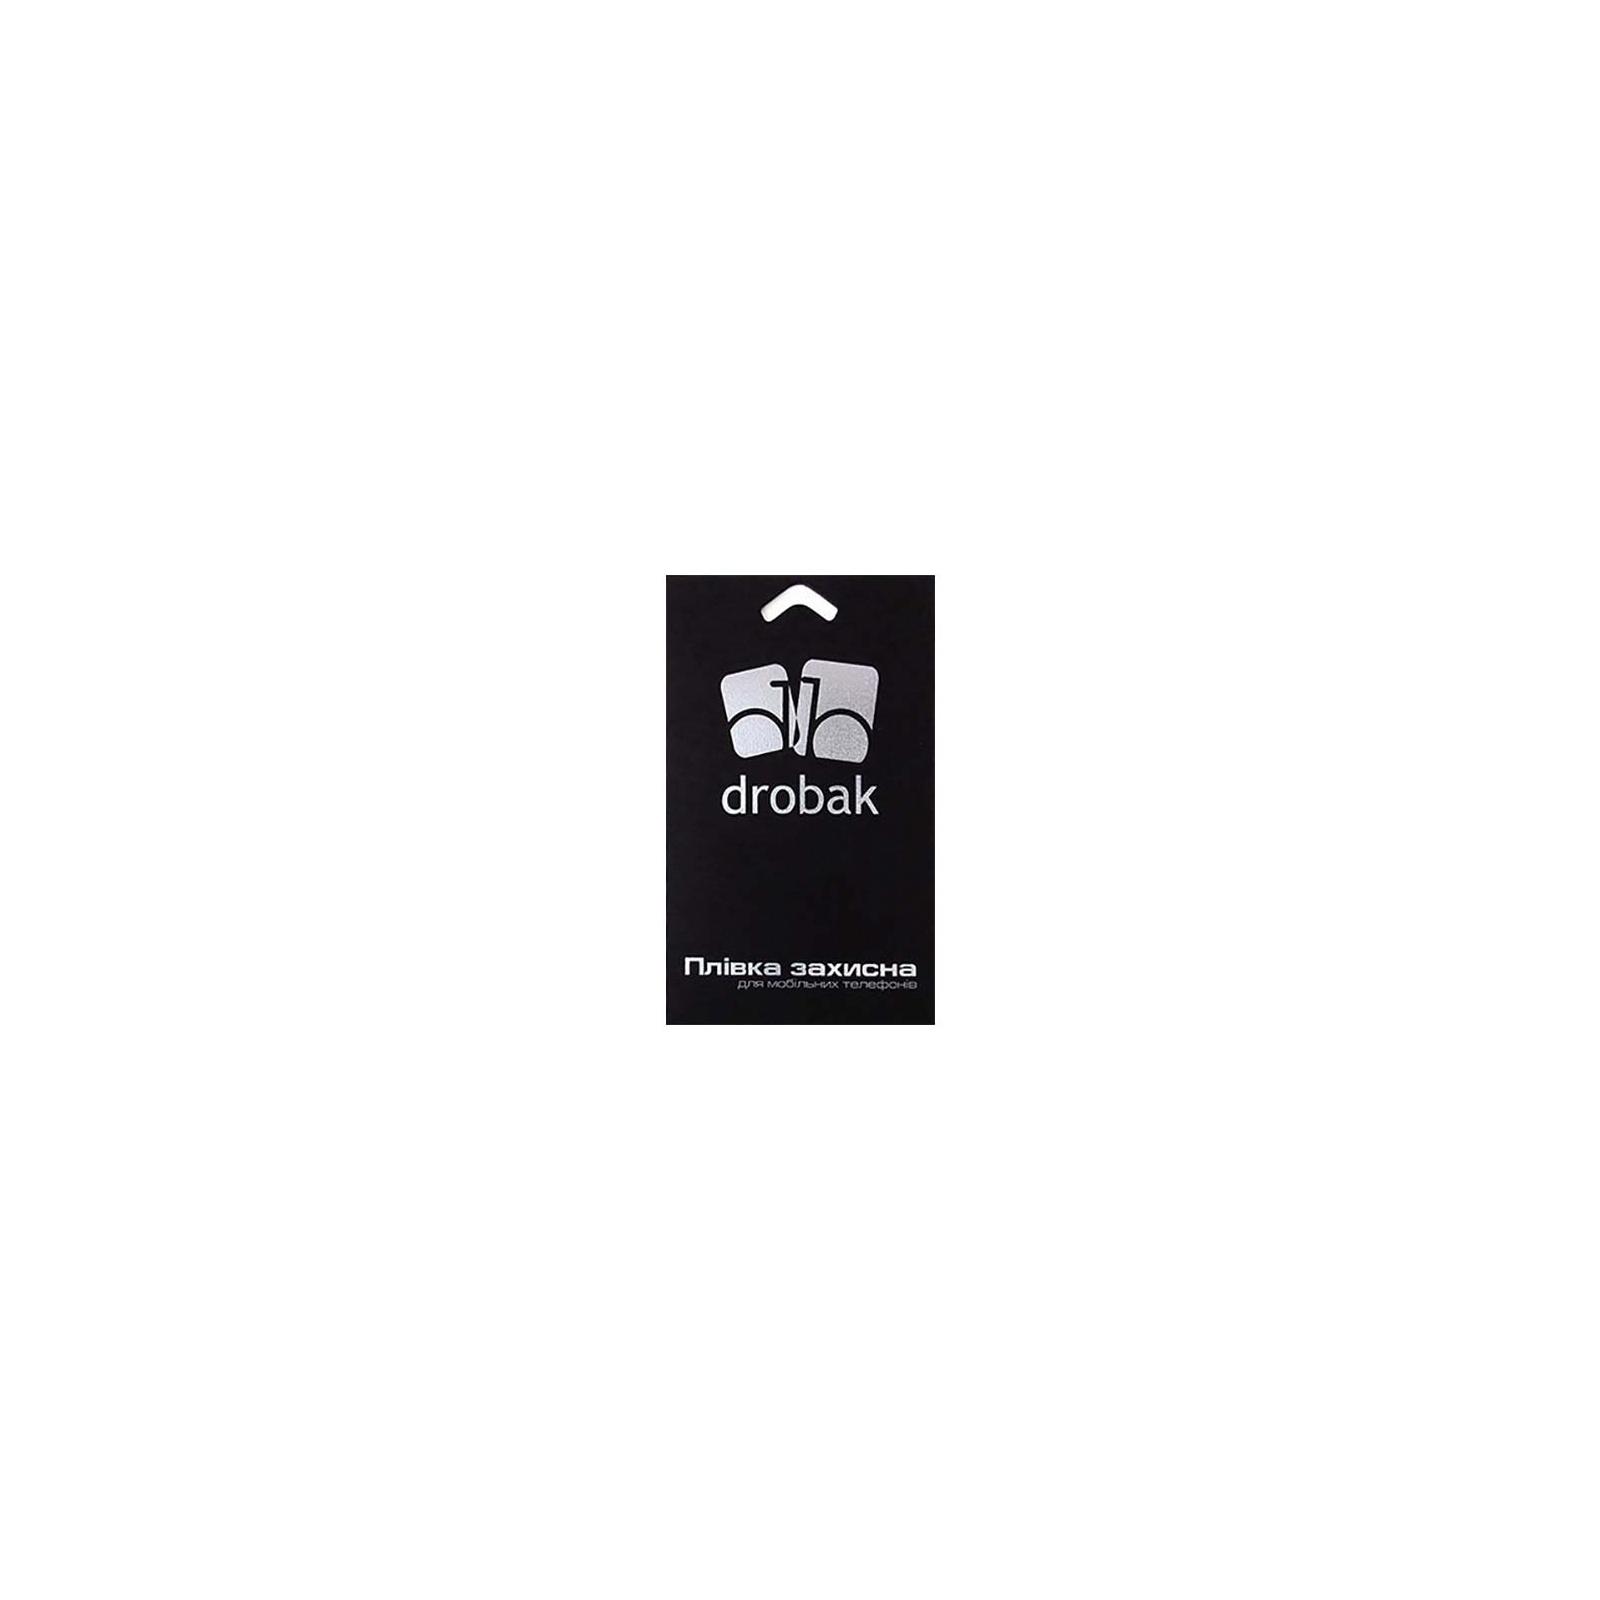 Пленка защитная Drobak для Nokia XL (505124)